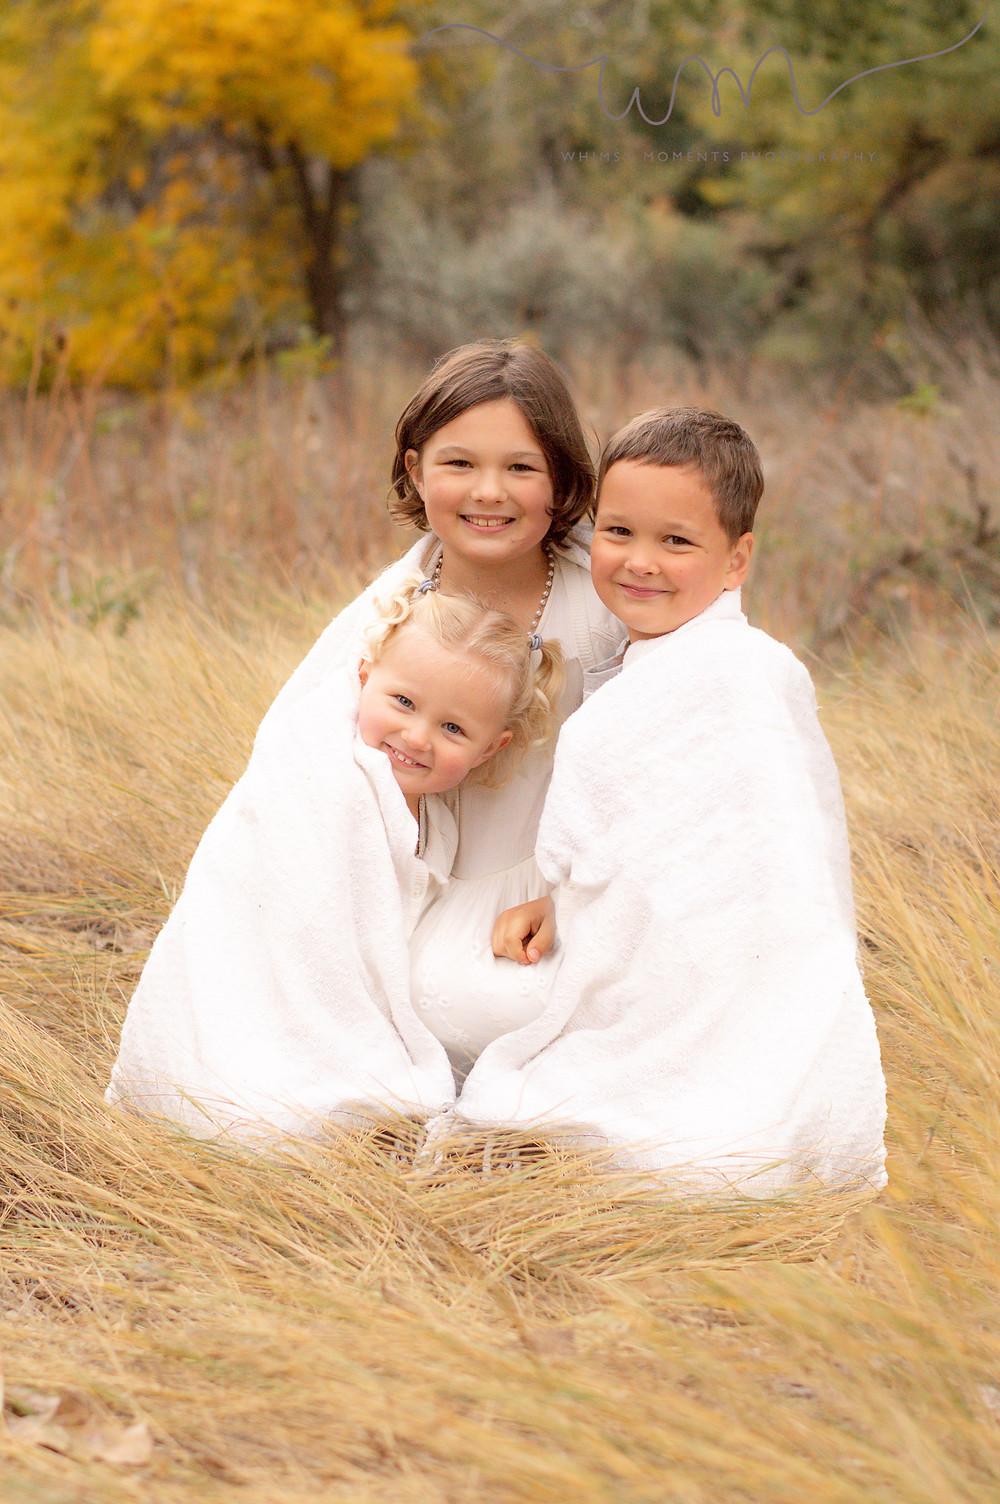 Brush Colorado Family Session Kids snuggling